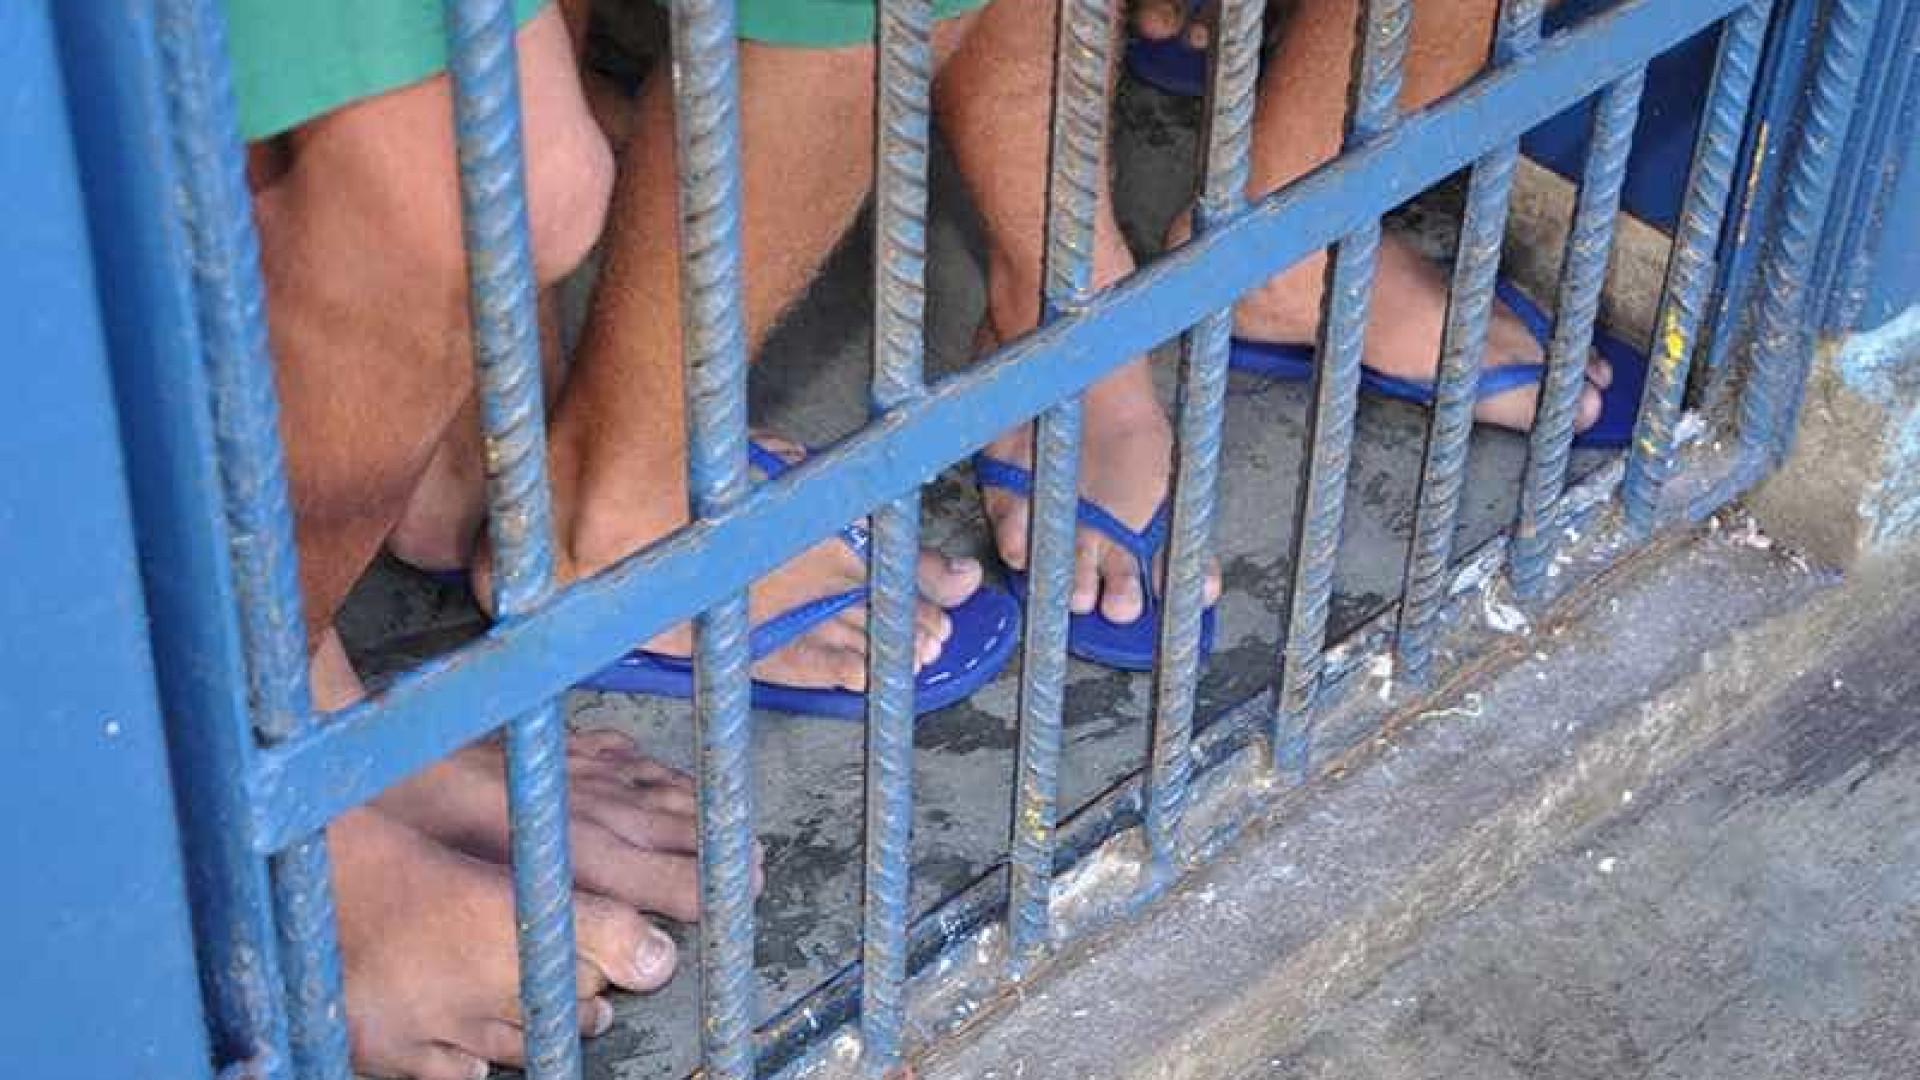 Detento escapa de delegacia, pula muro de creche e foge em Gravataí